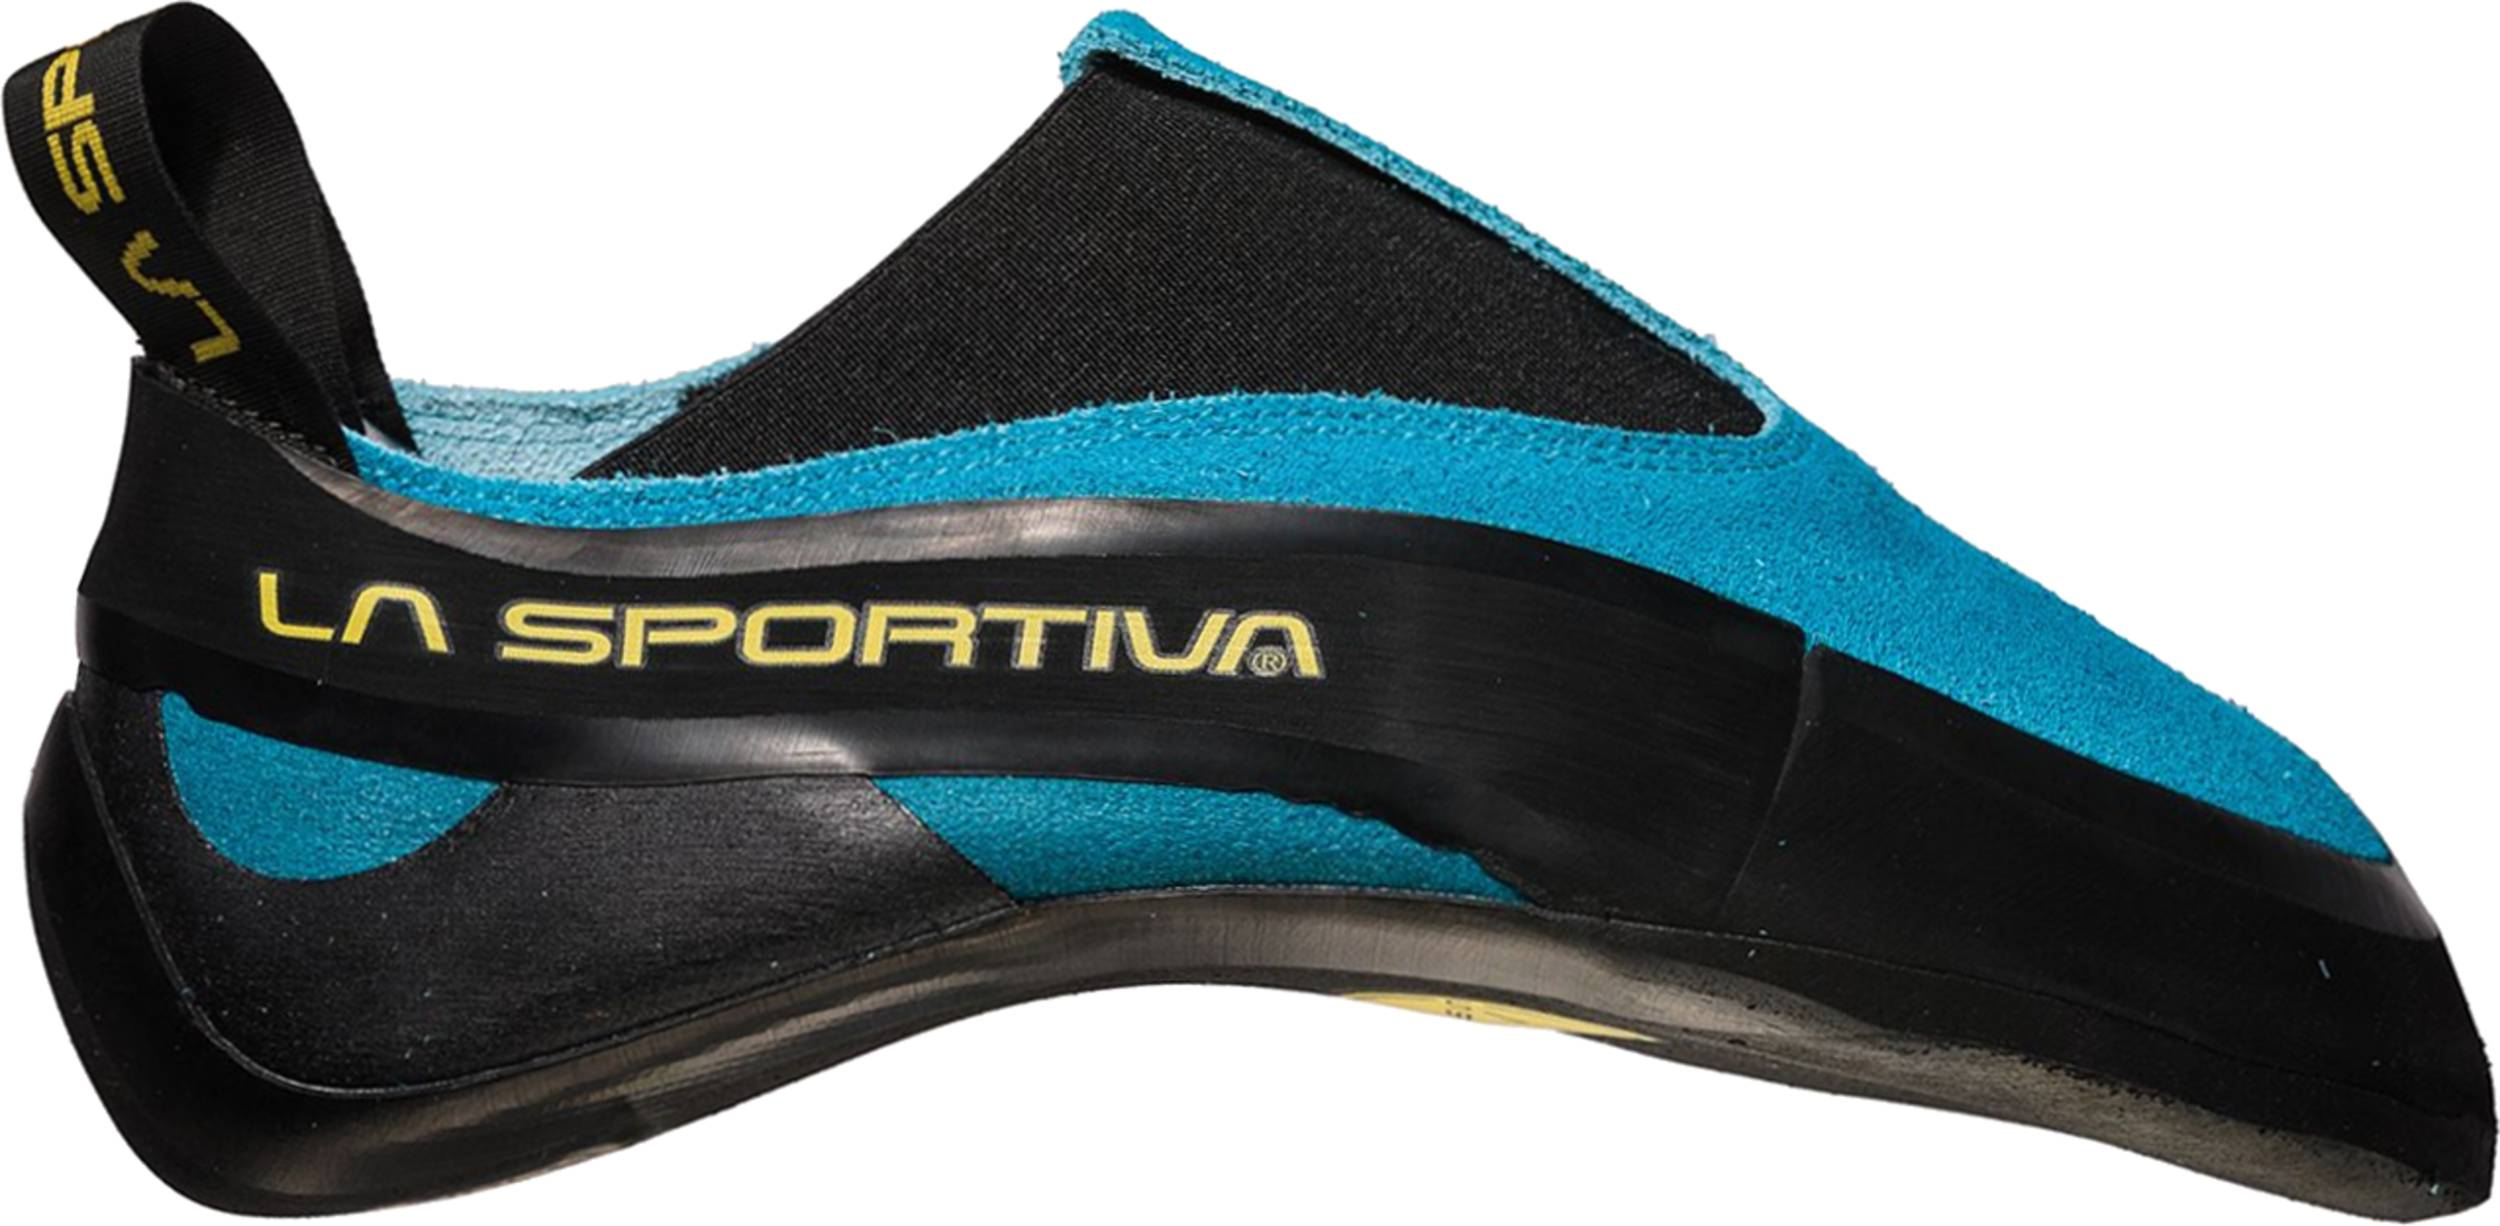 climbing bouldering active casual 60/% OFF RETAIL La Sportiva Rauti Belt